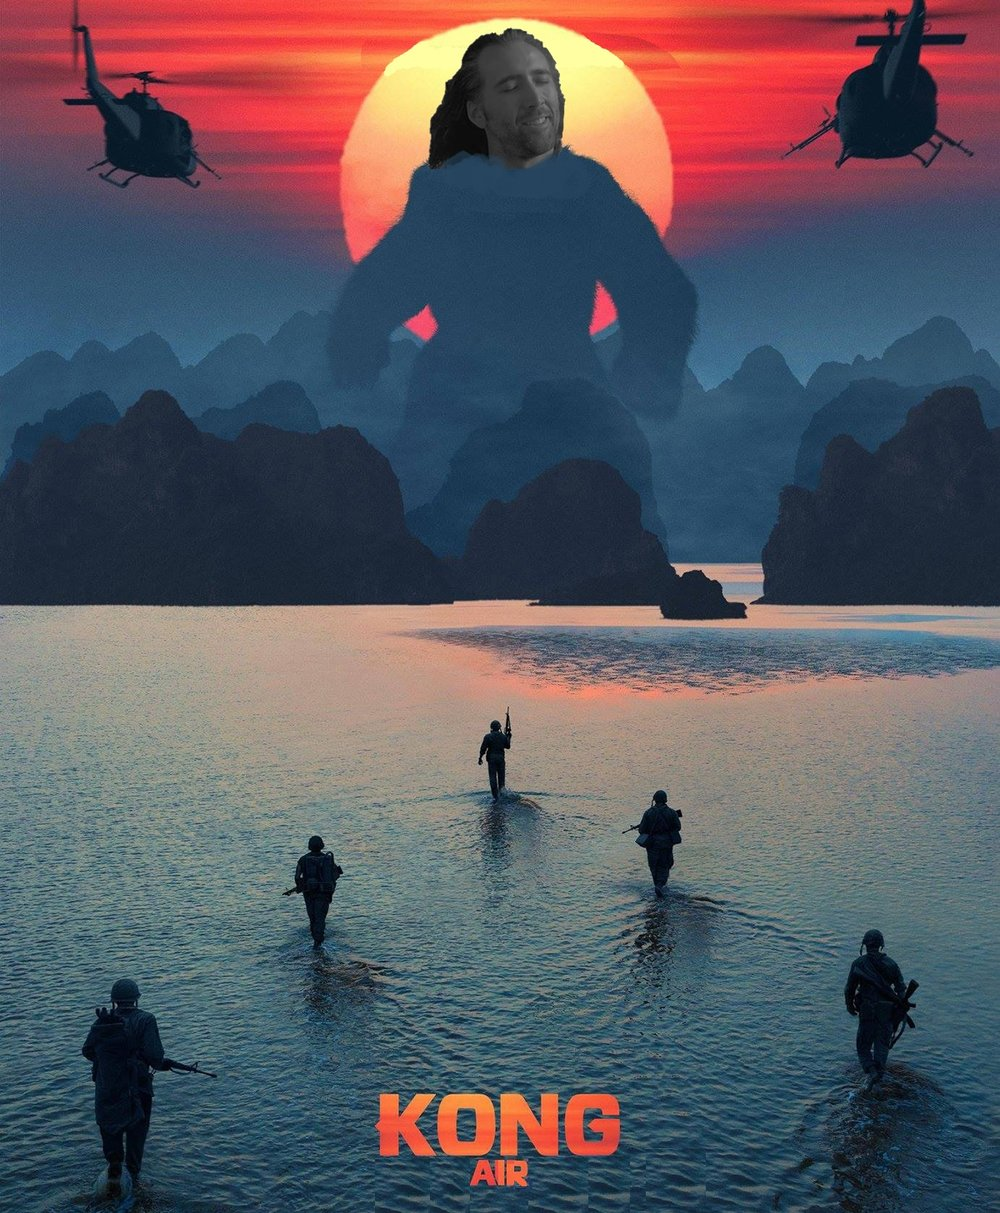 Kong Air Poster.jpg